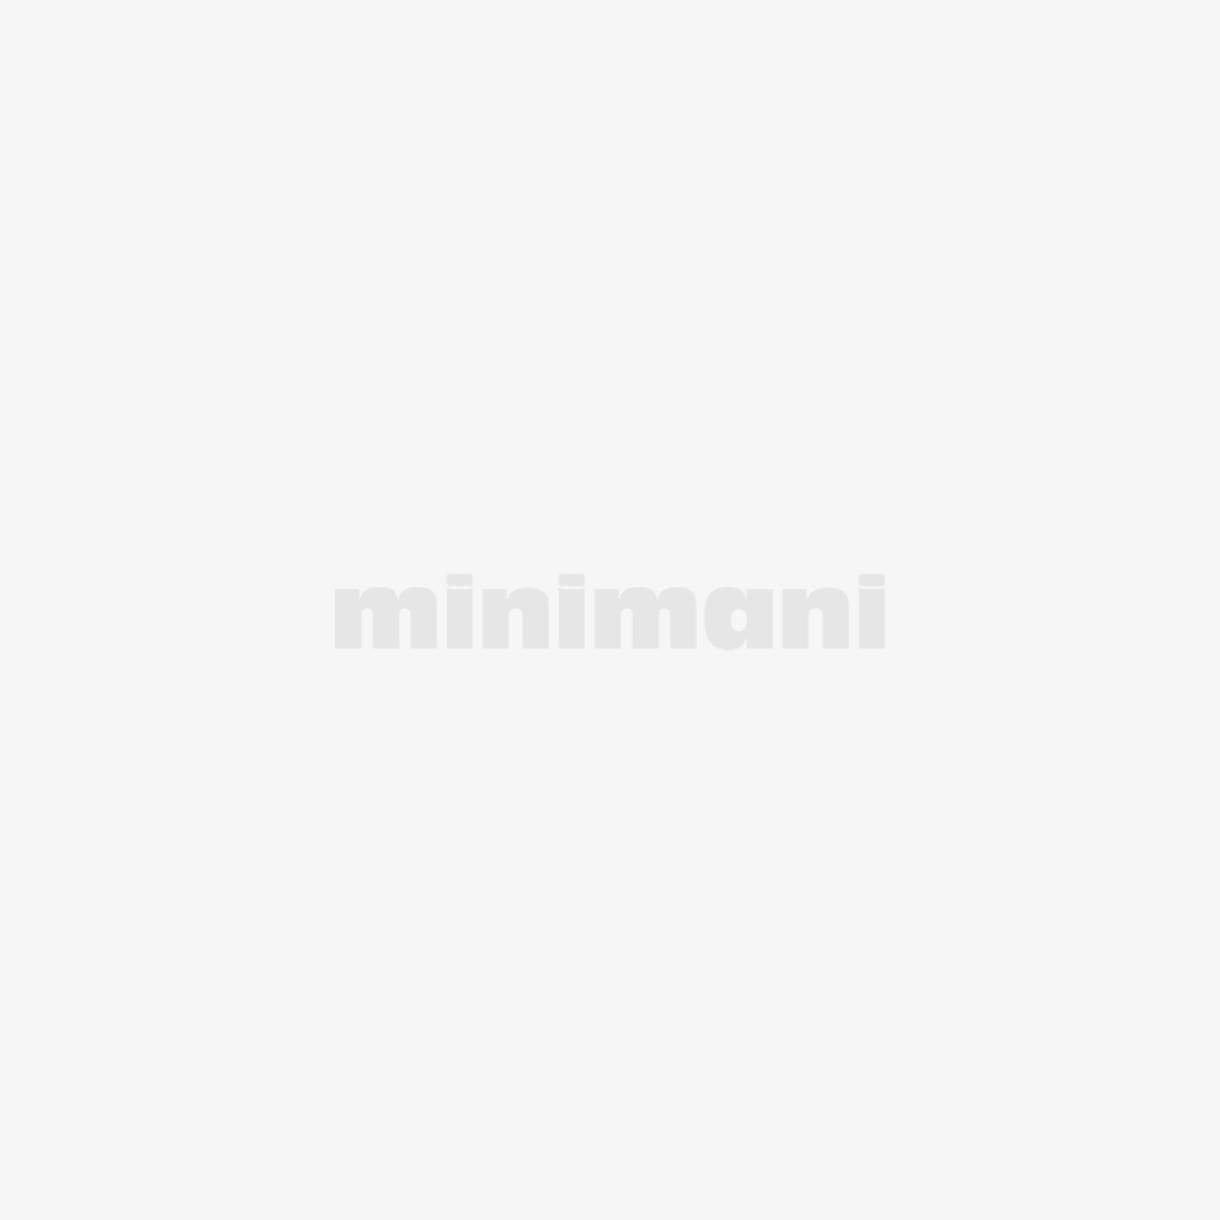 METALTEX FLORENZ SUORAHYLLY 2-OS 31X10X32 CM